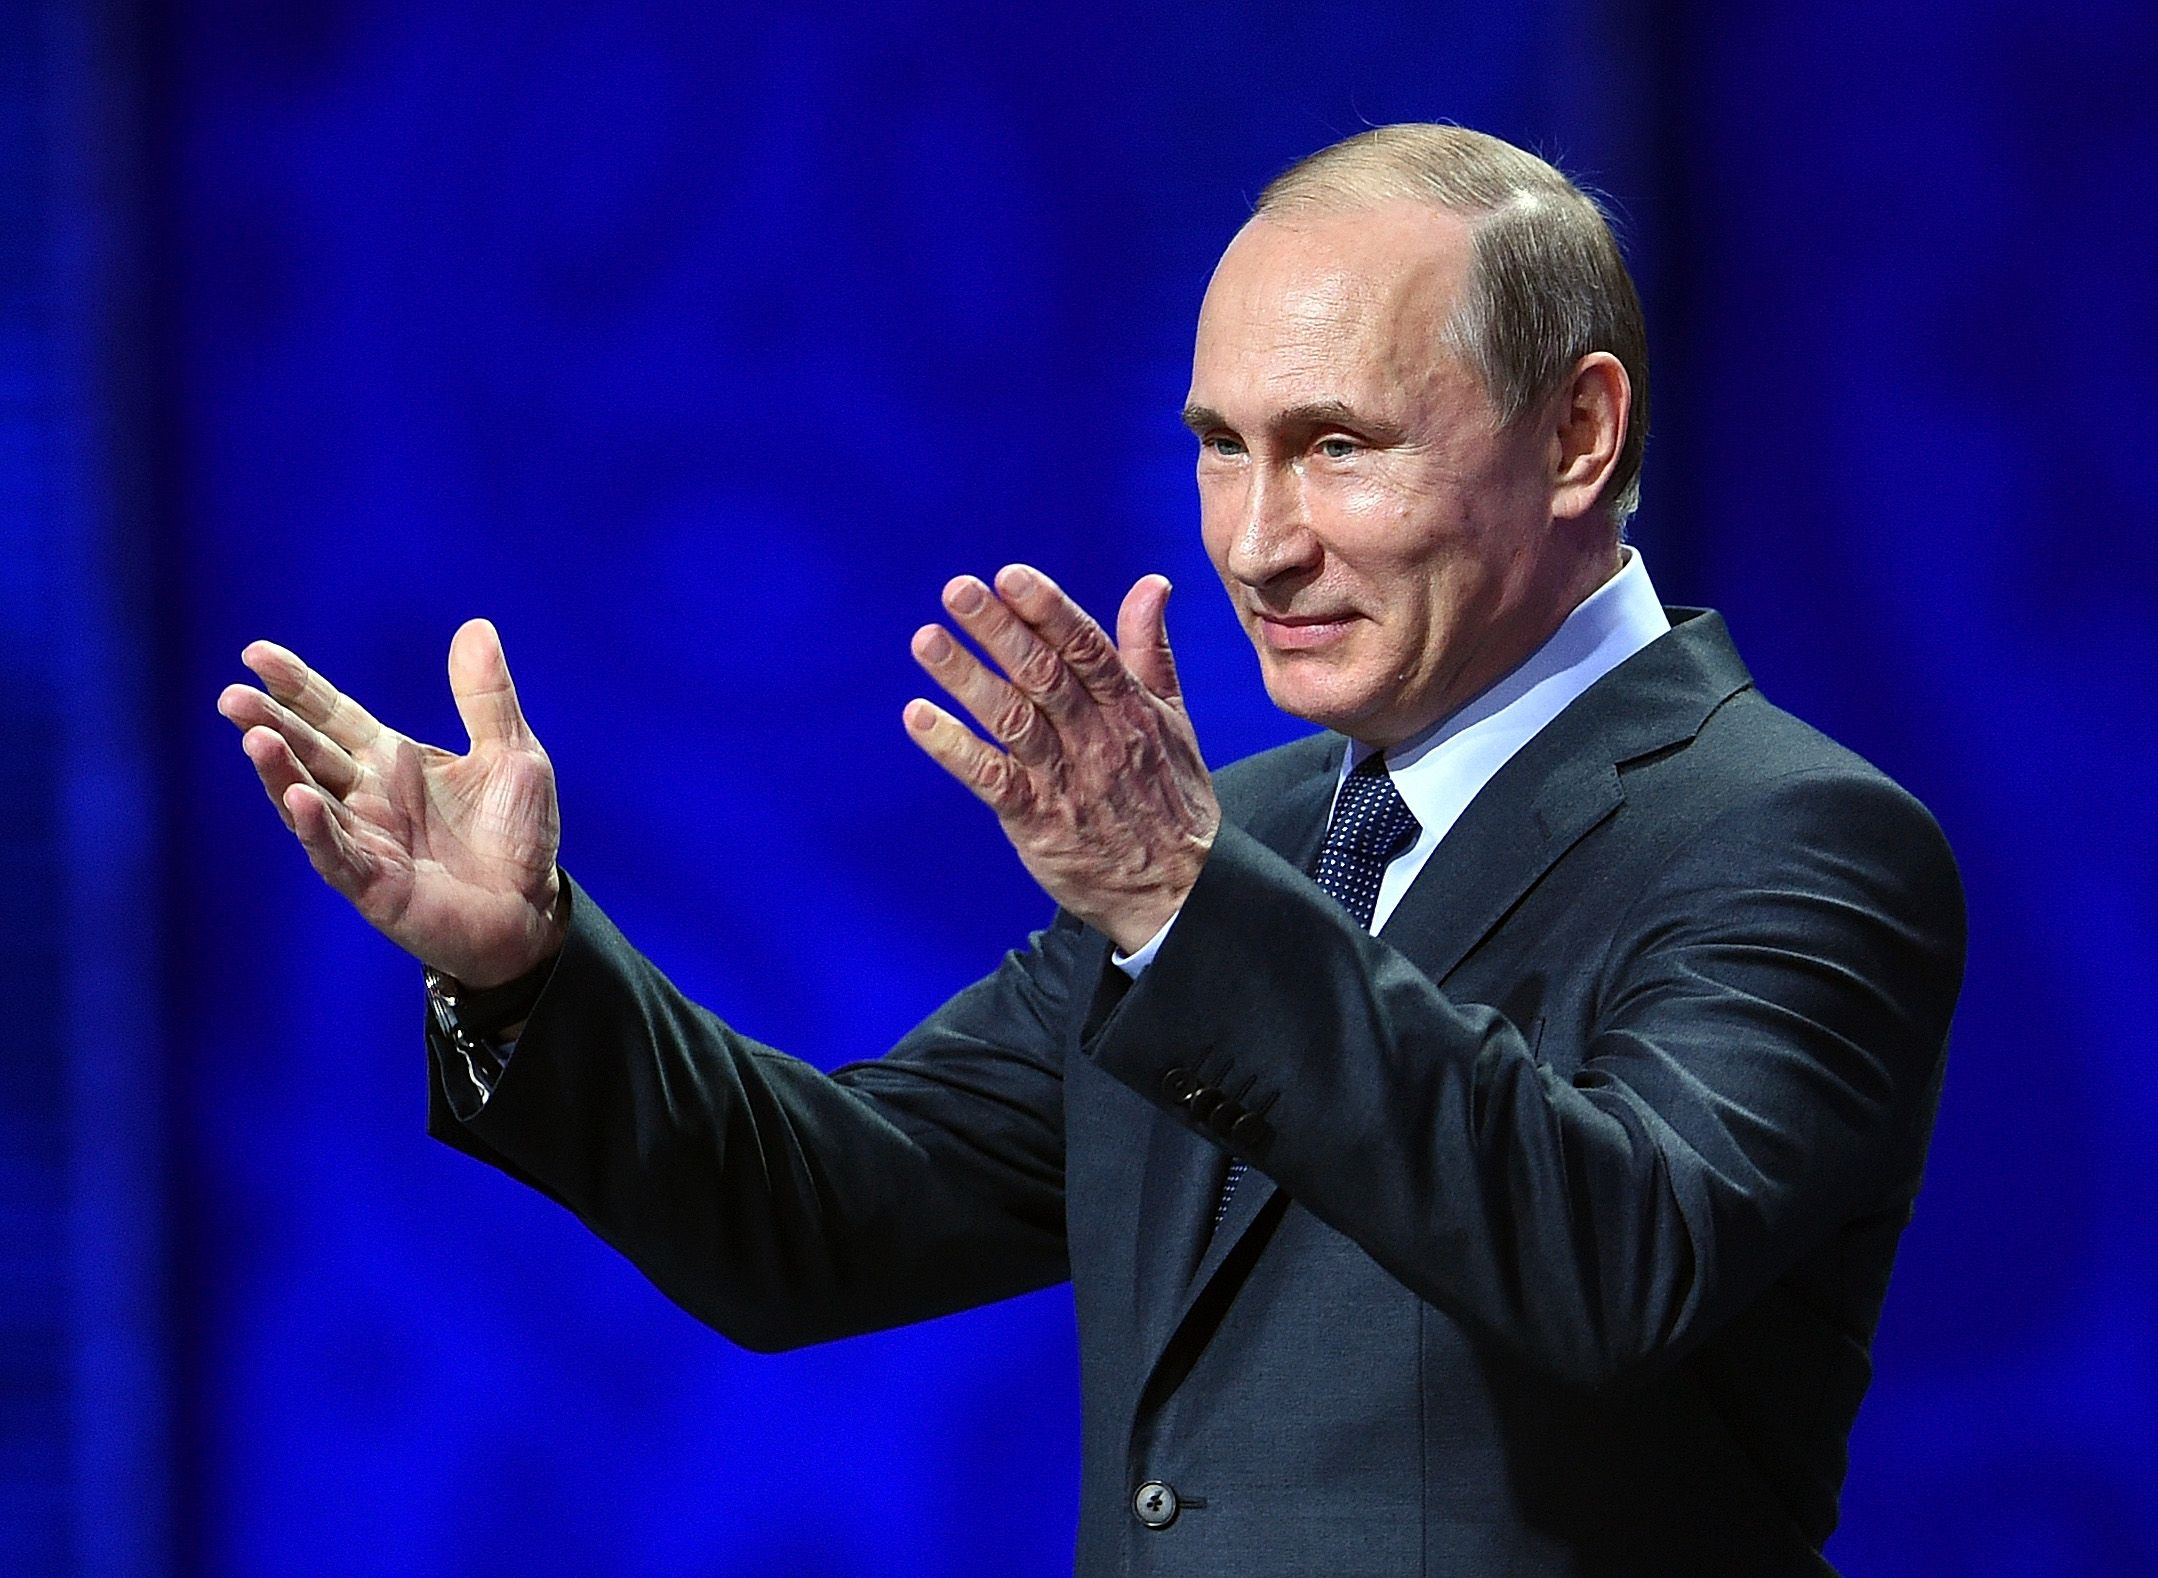 GettyImages-481901172 Vladimir Putin